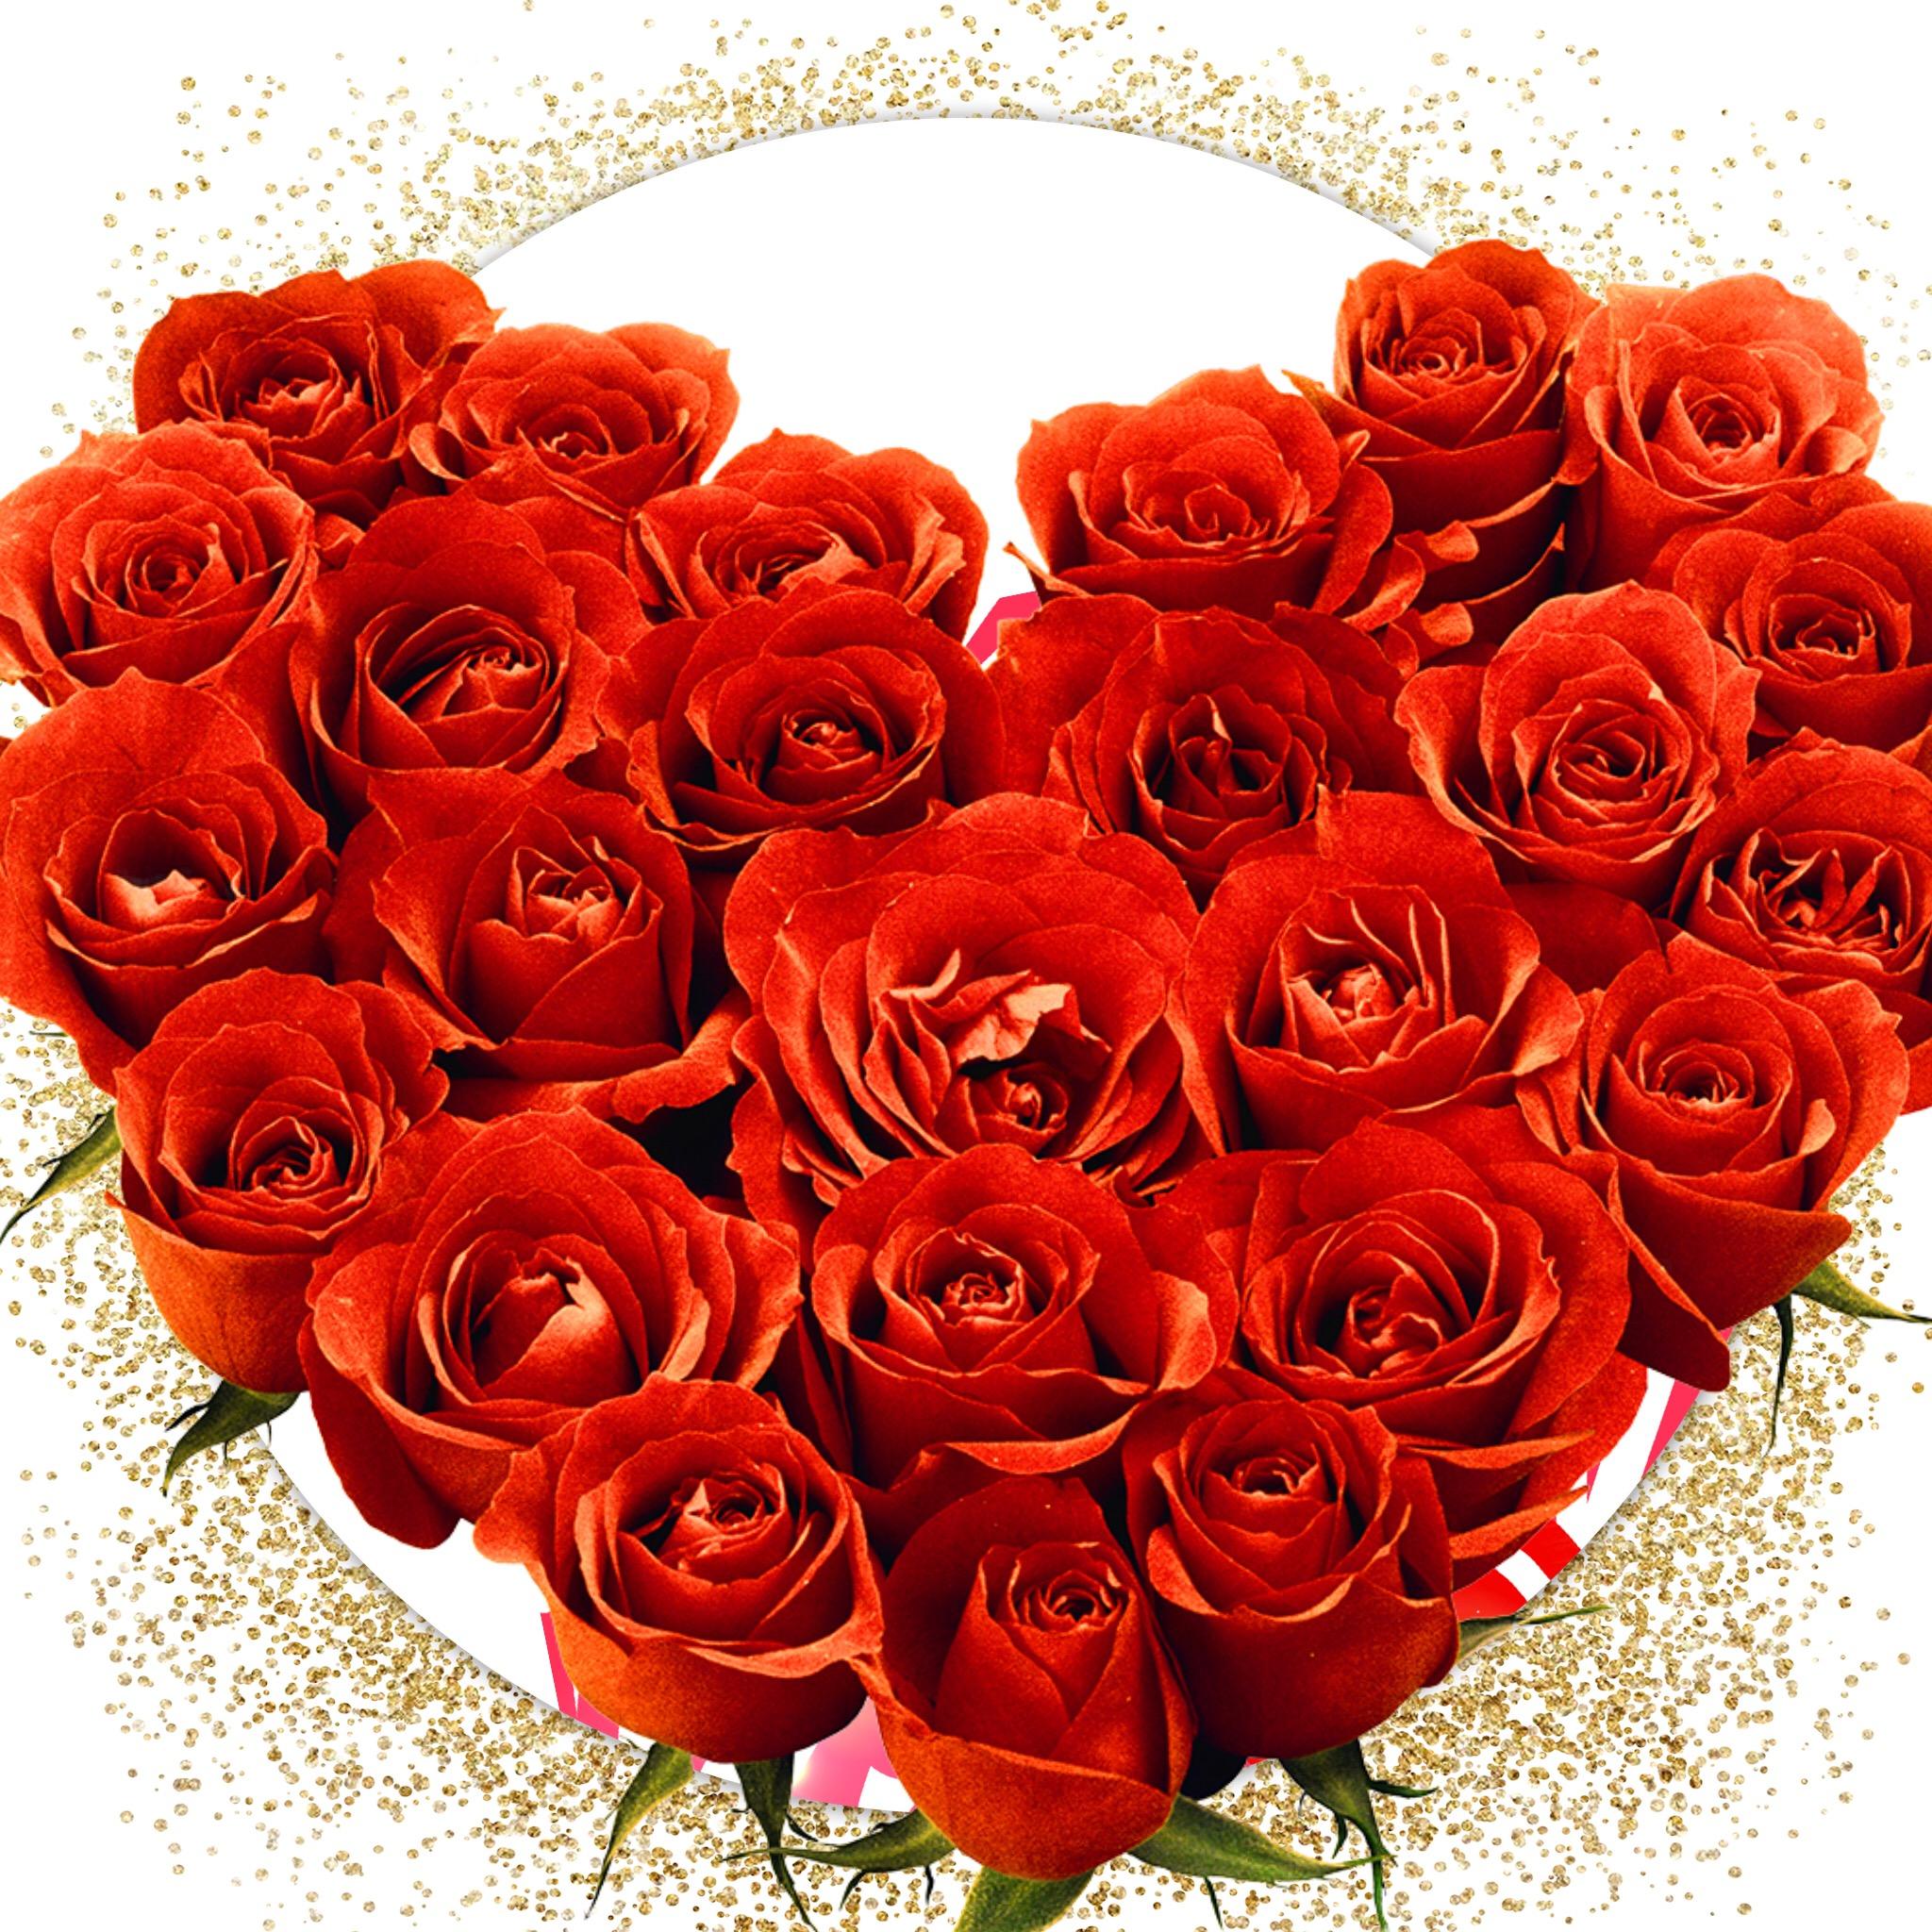 Картинка розы для тебя оля